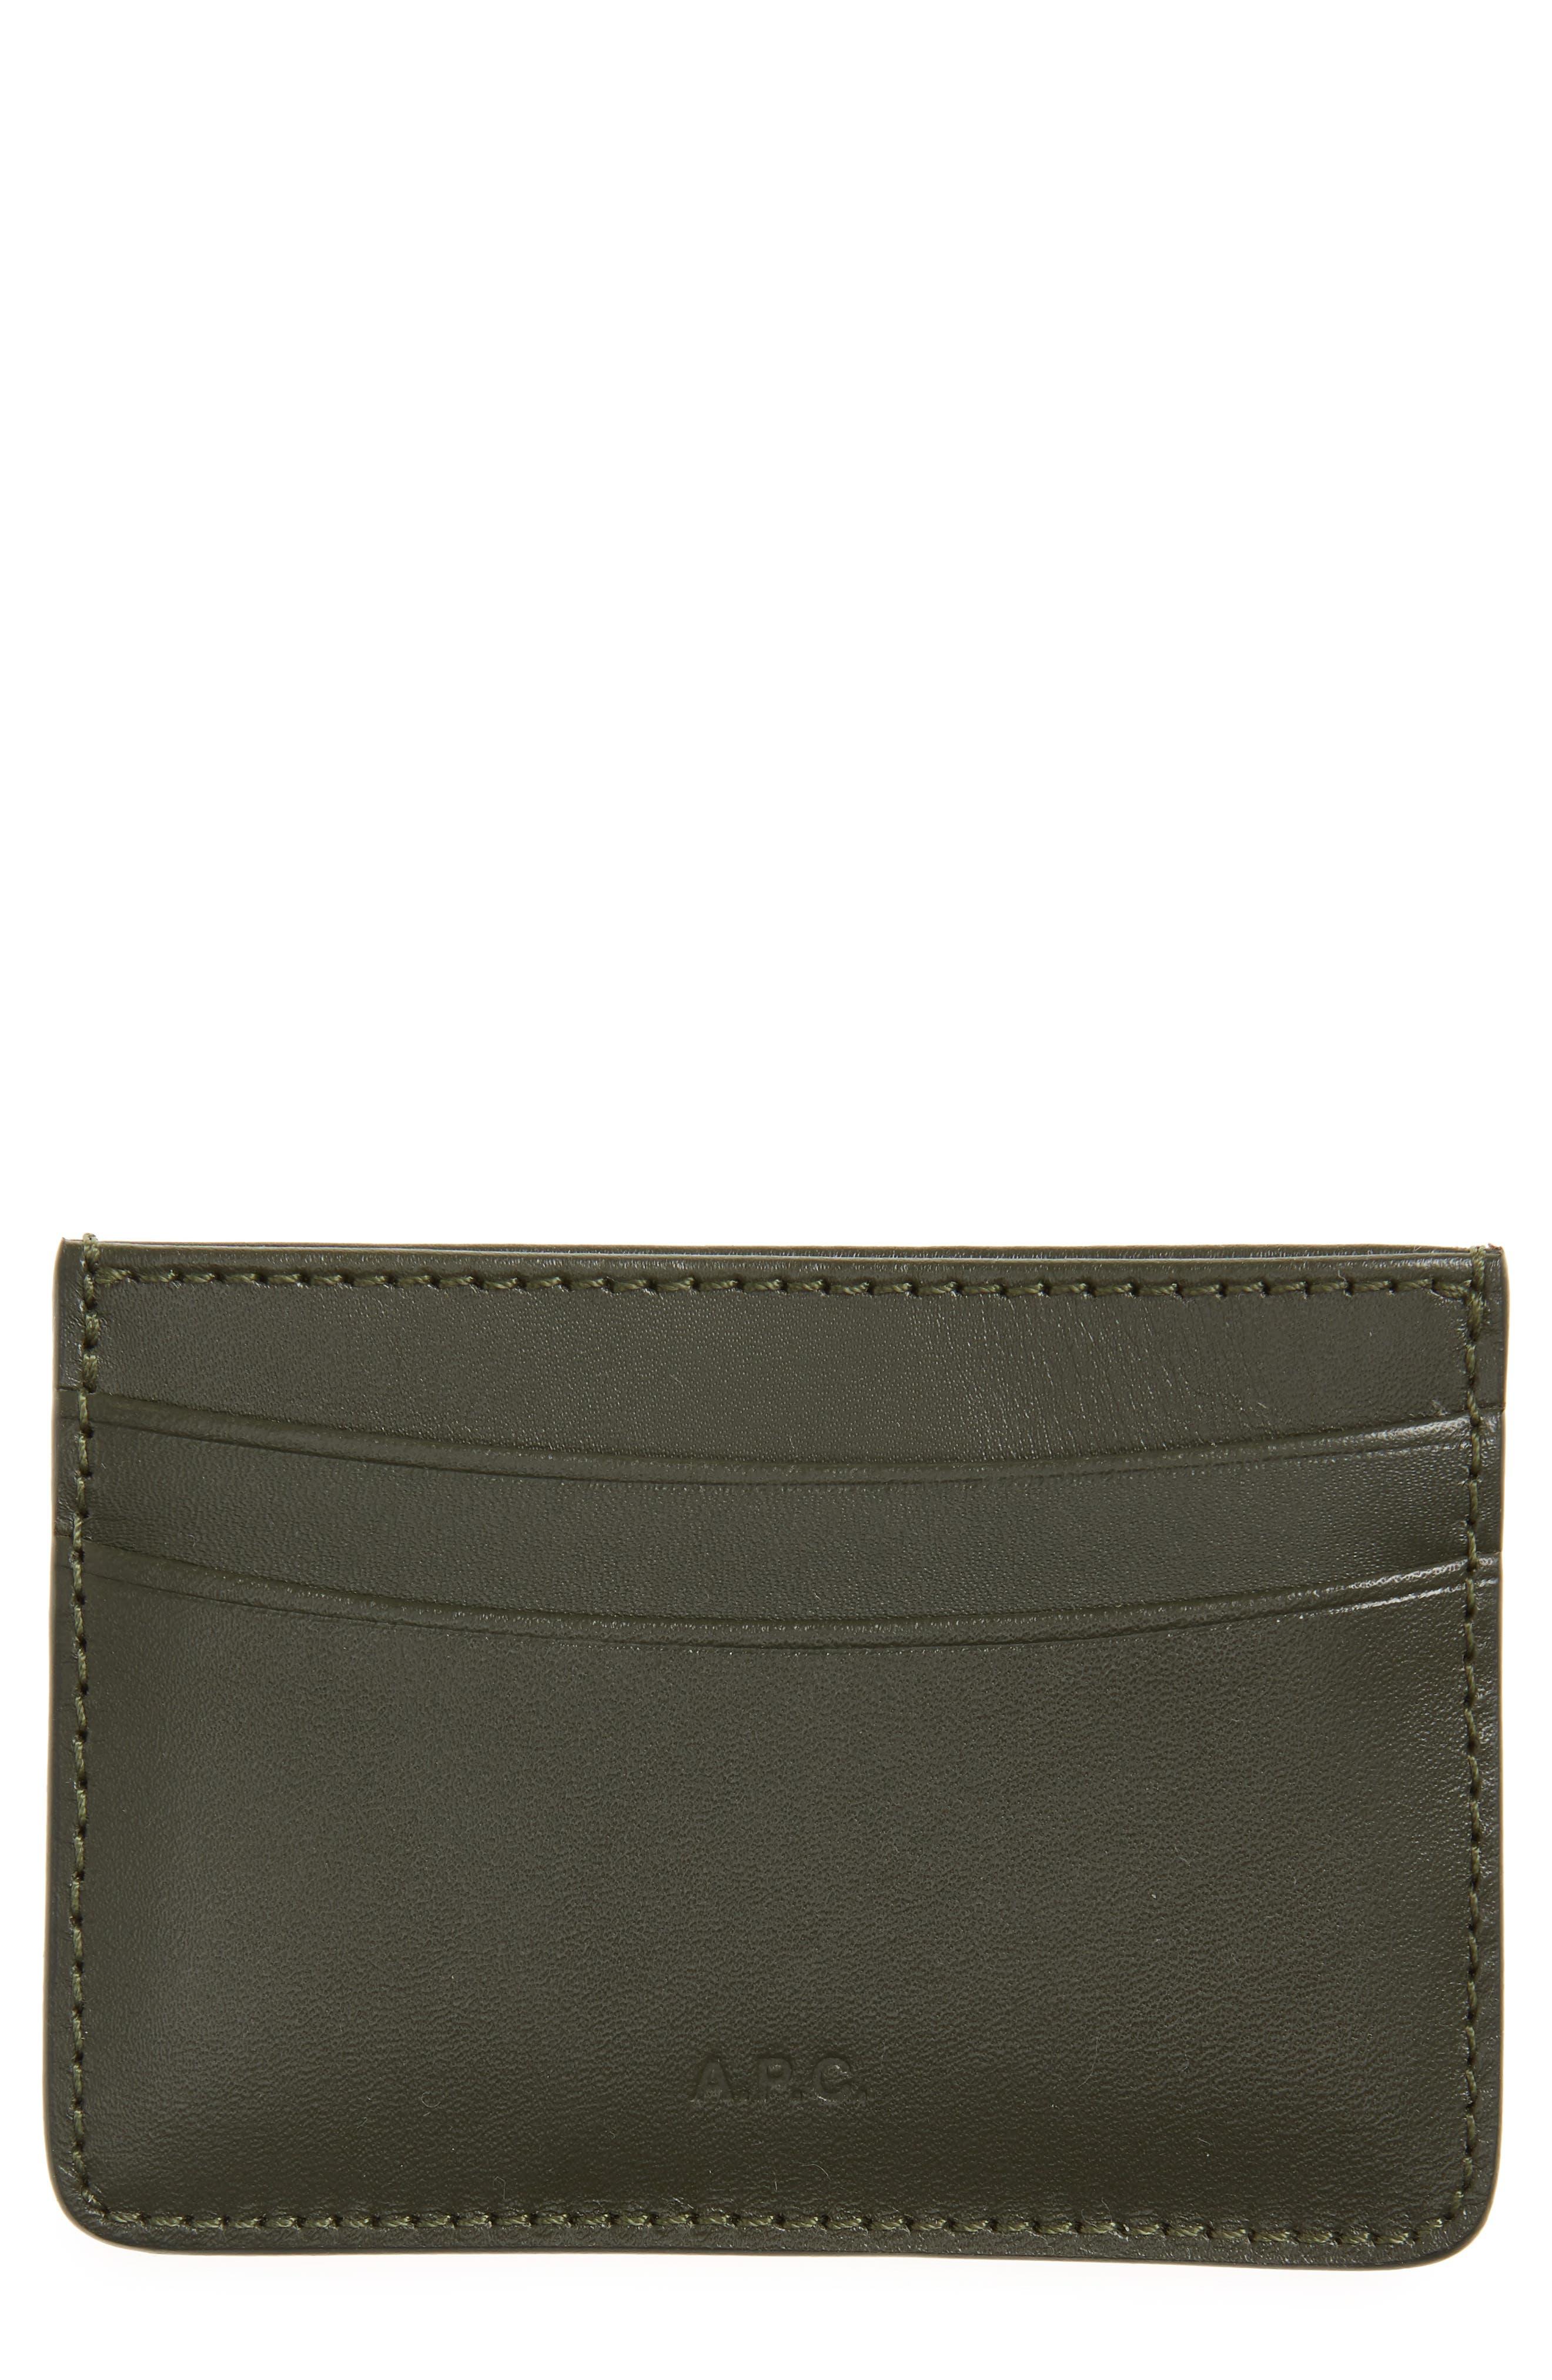 Andre Leather Card Case,                             Main thumbnail 1, color,                             KHAKI